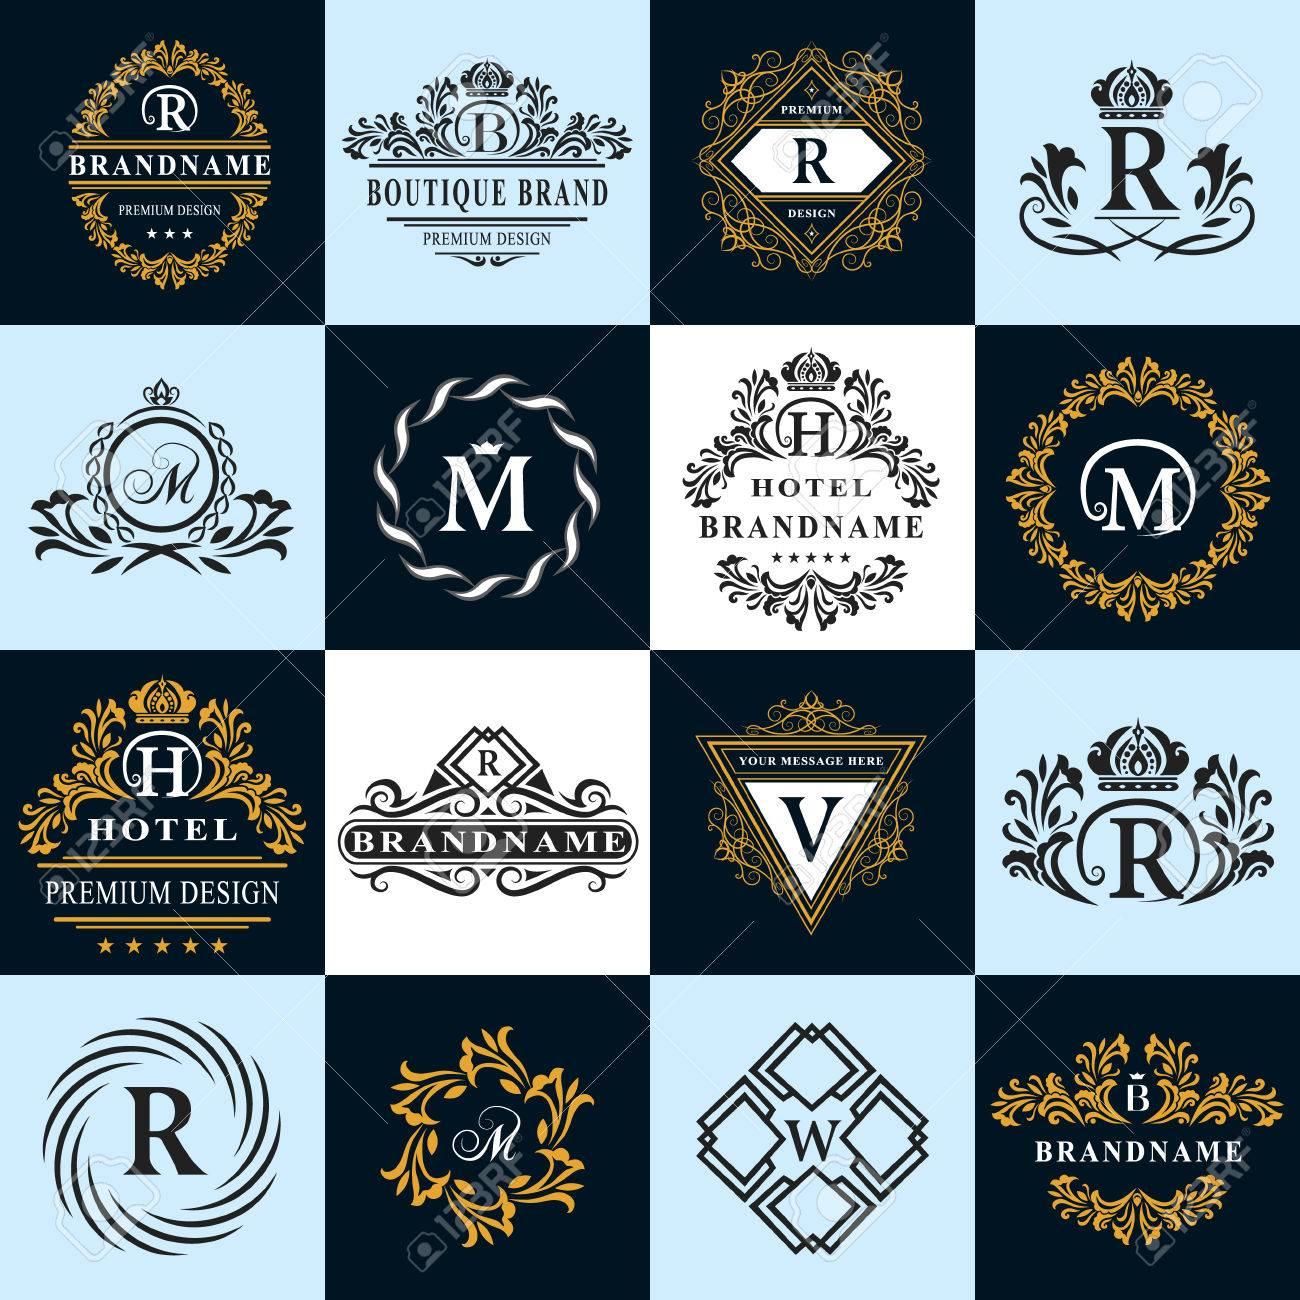 Vector graphic design business logo - Vector Illustration Of Monogram Design Elements Graceful Template Calligraphic Elegant Line Art Logo Design